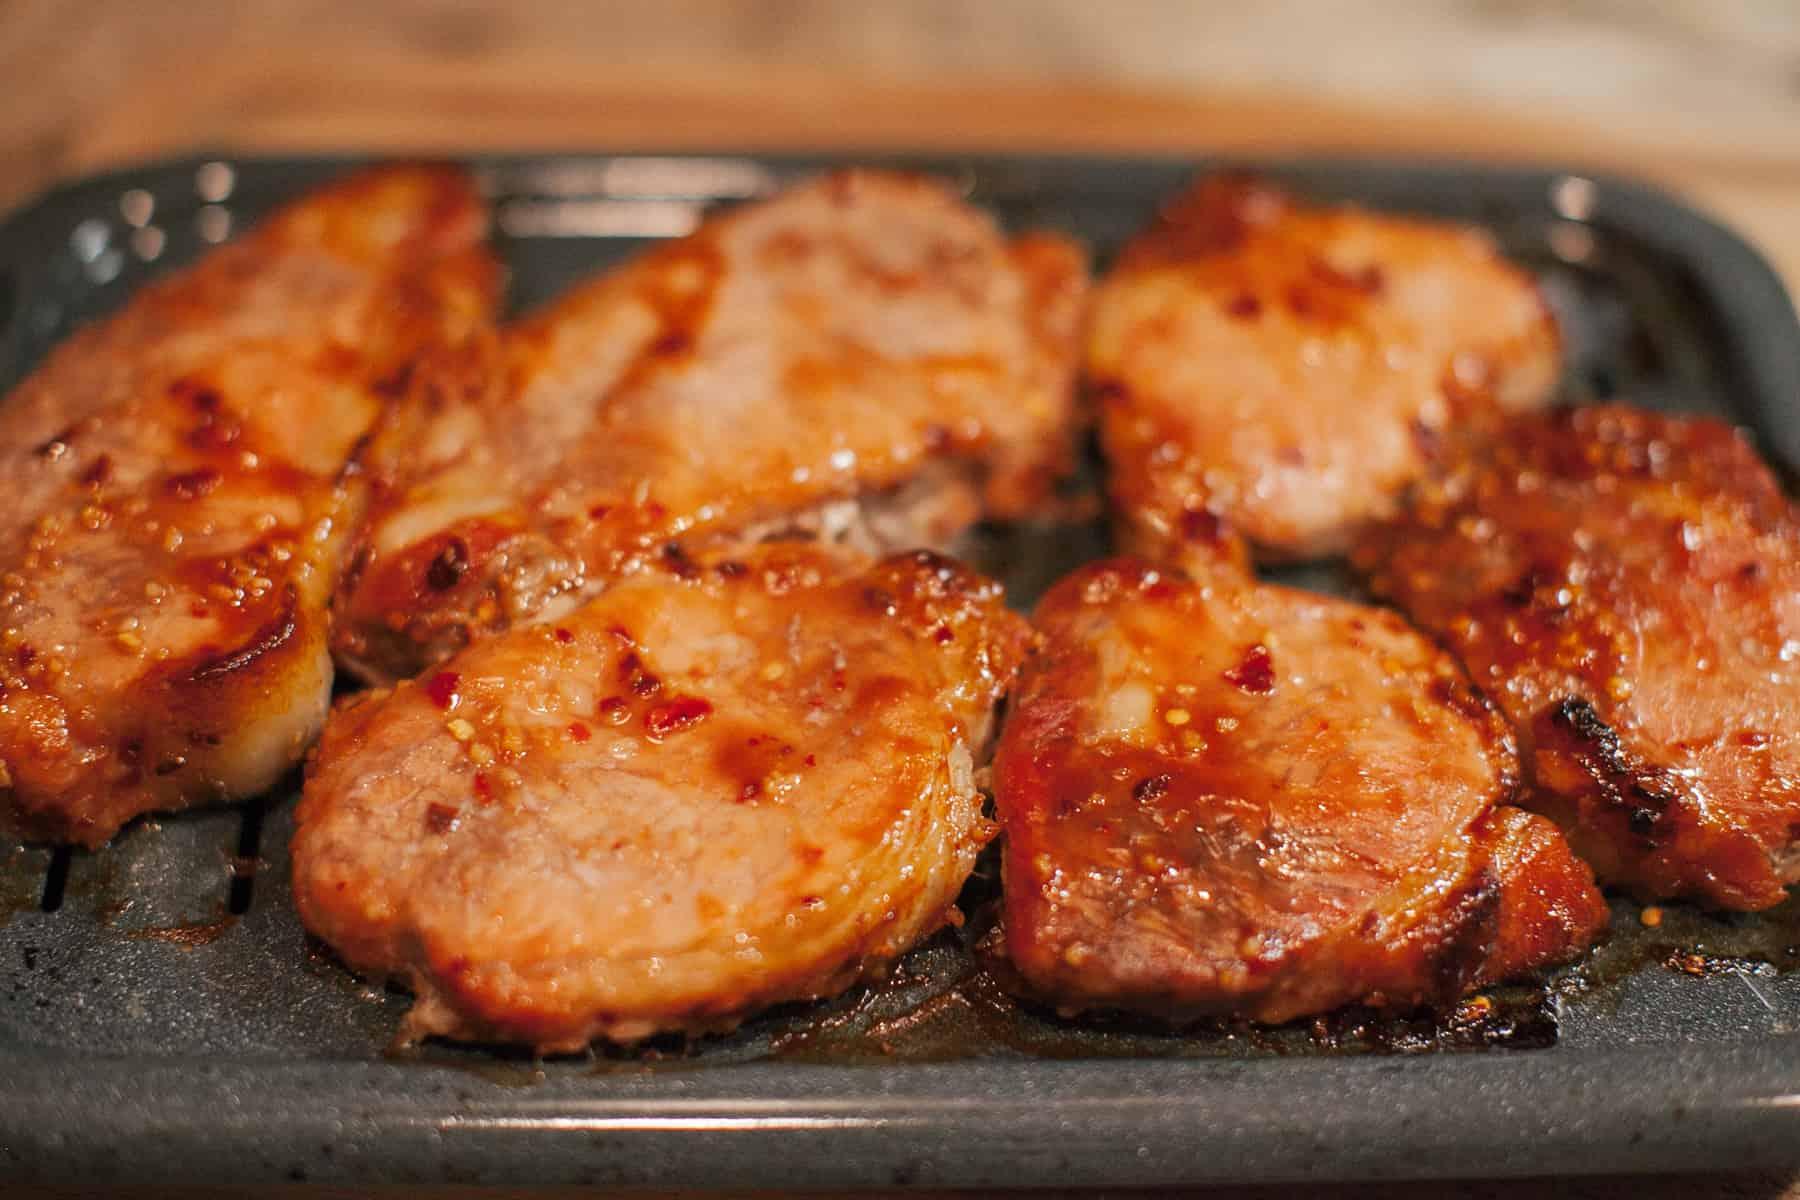 Spicy Honey Garlic Pork Chops